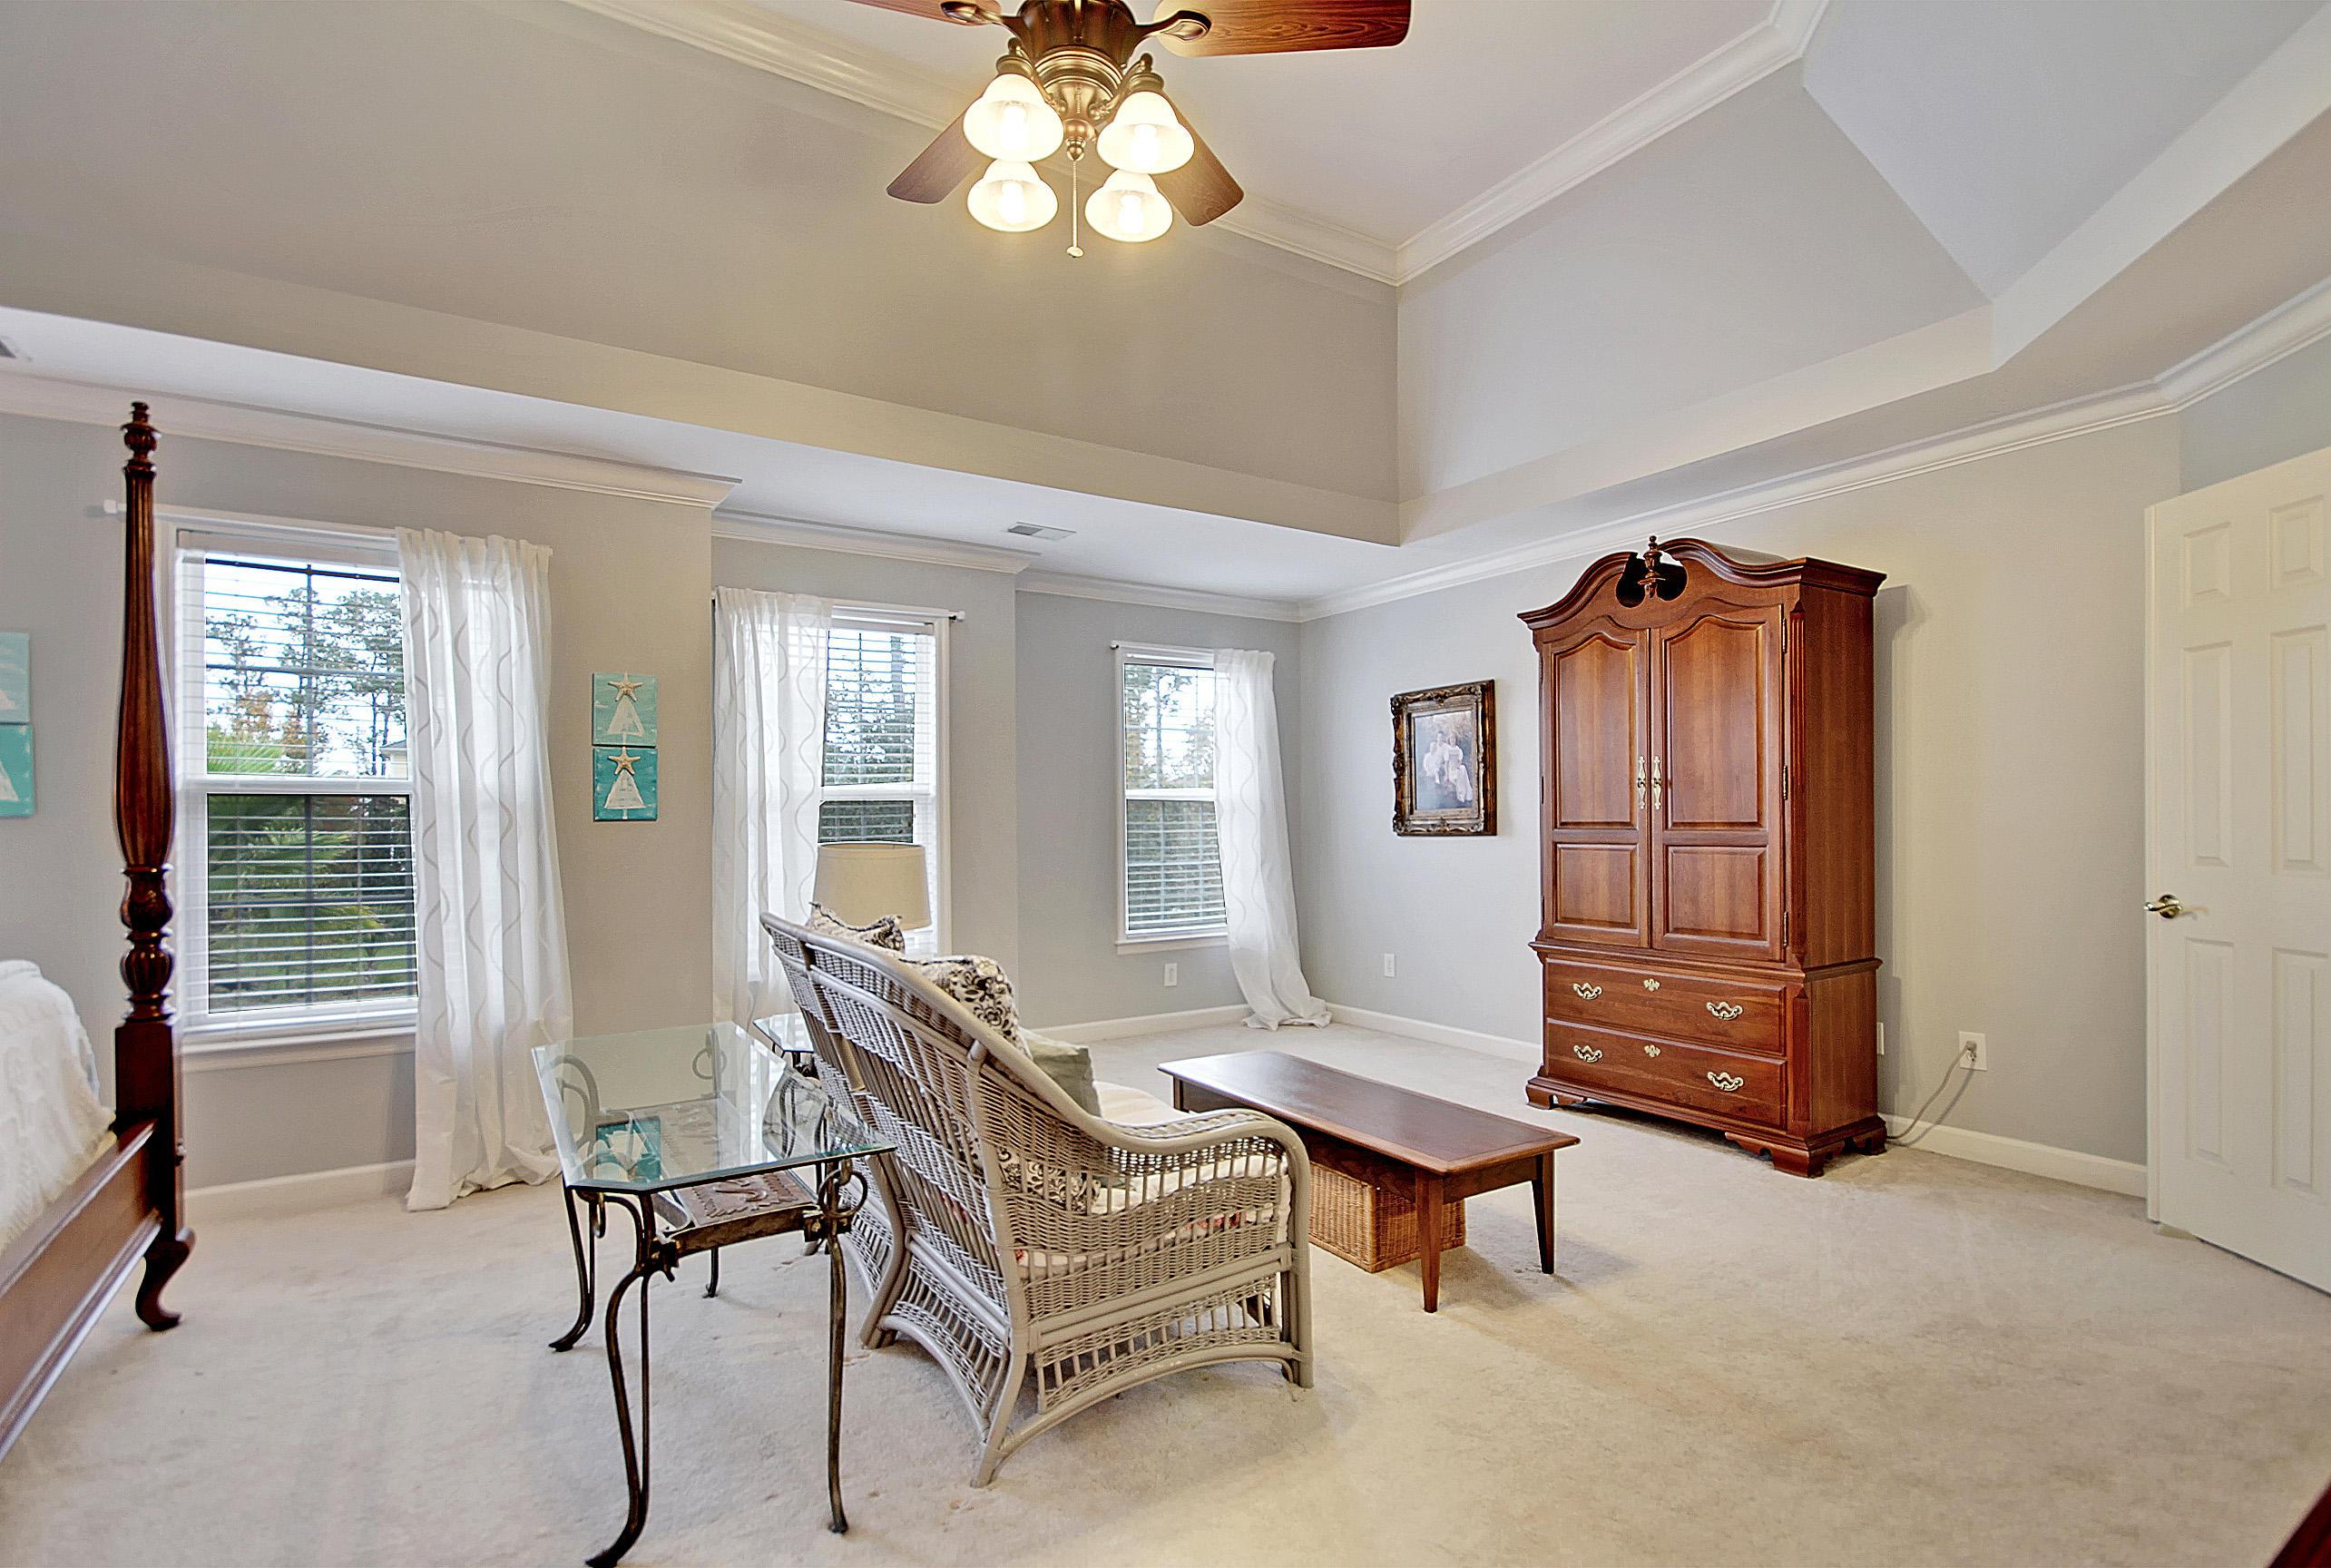 Dunes West Homes For Sale - 2449 Darts Cove, Mount Pleasant, SC - 36